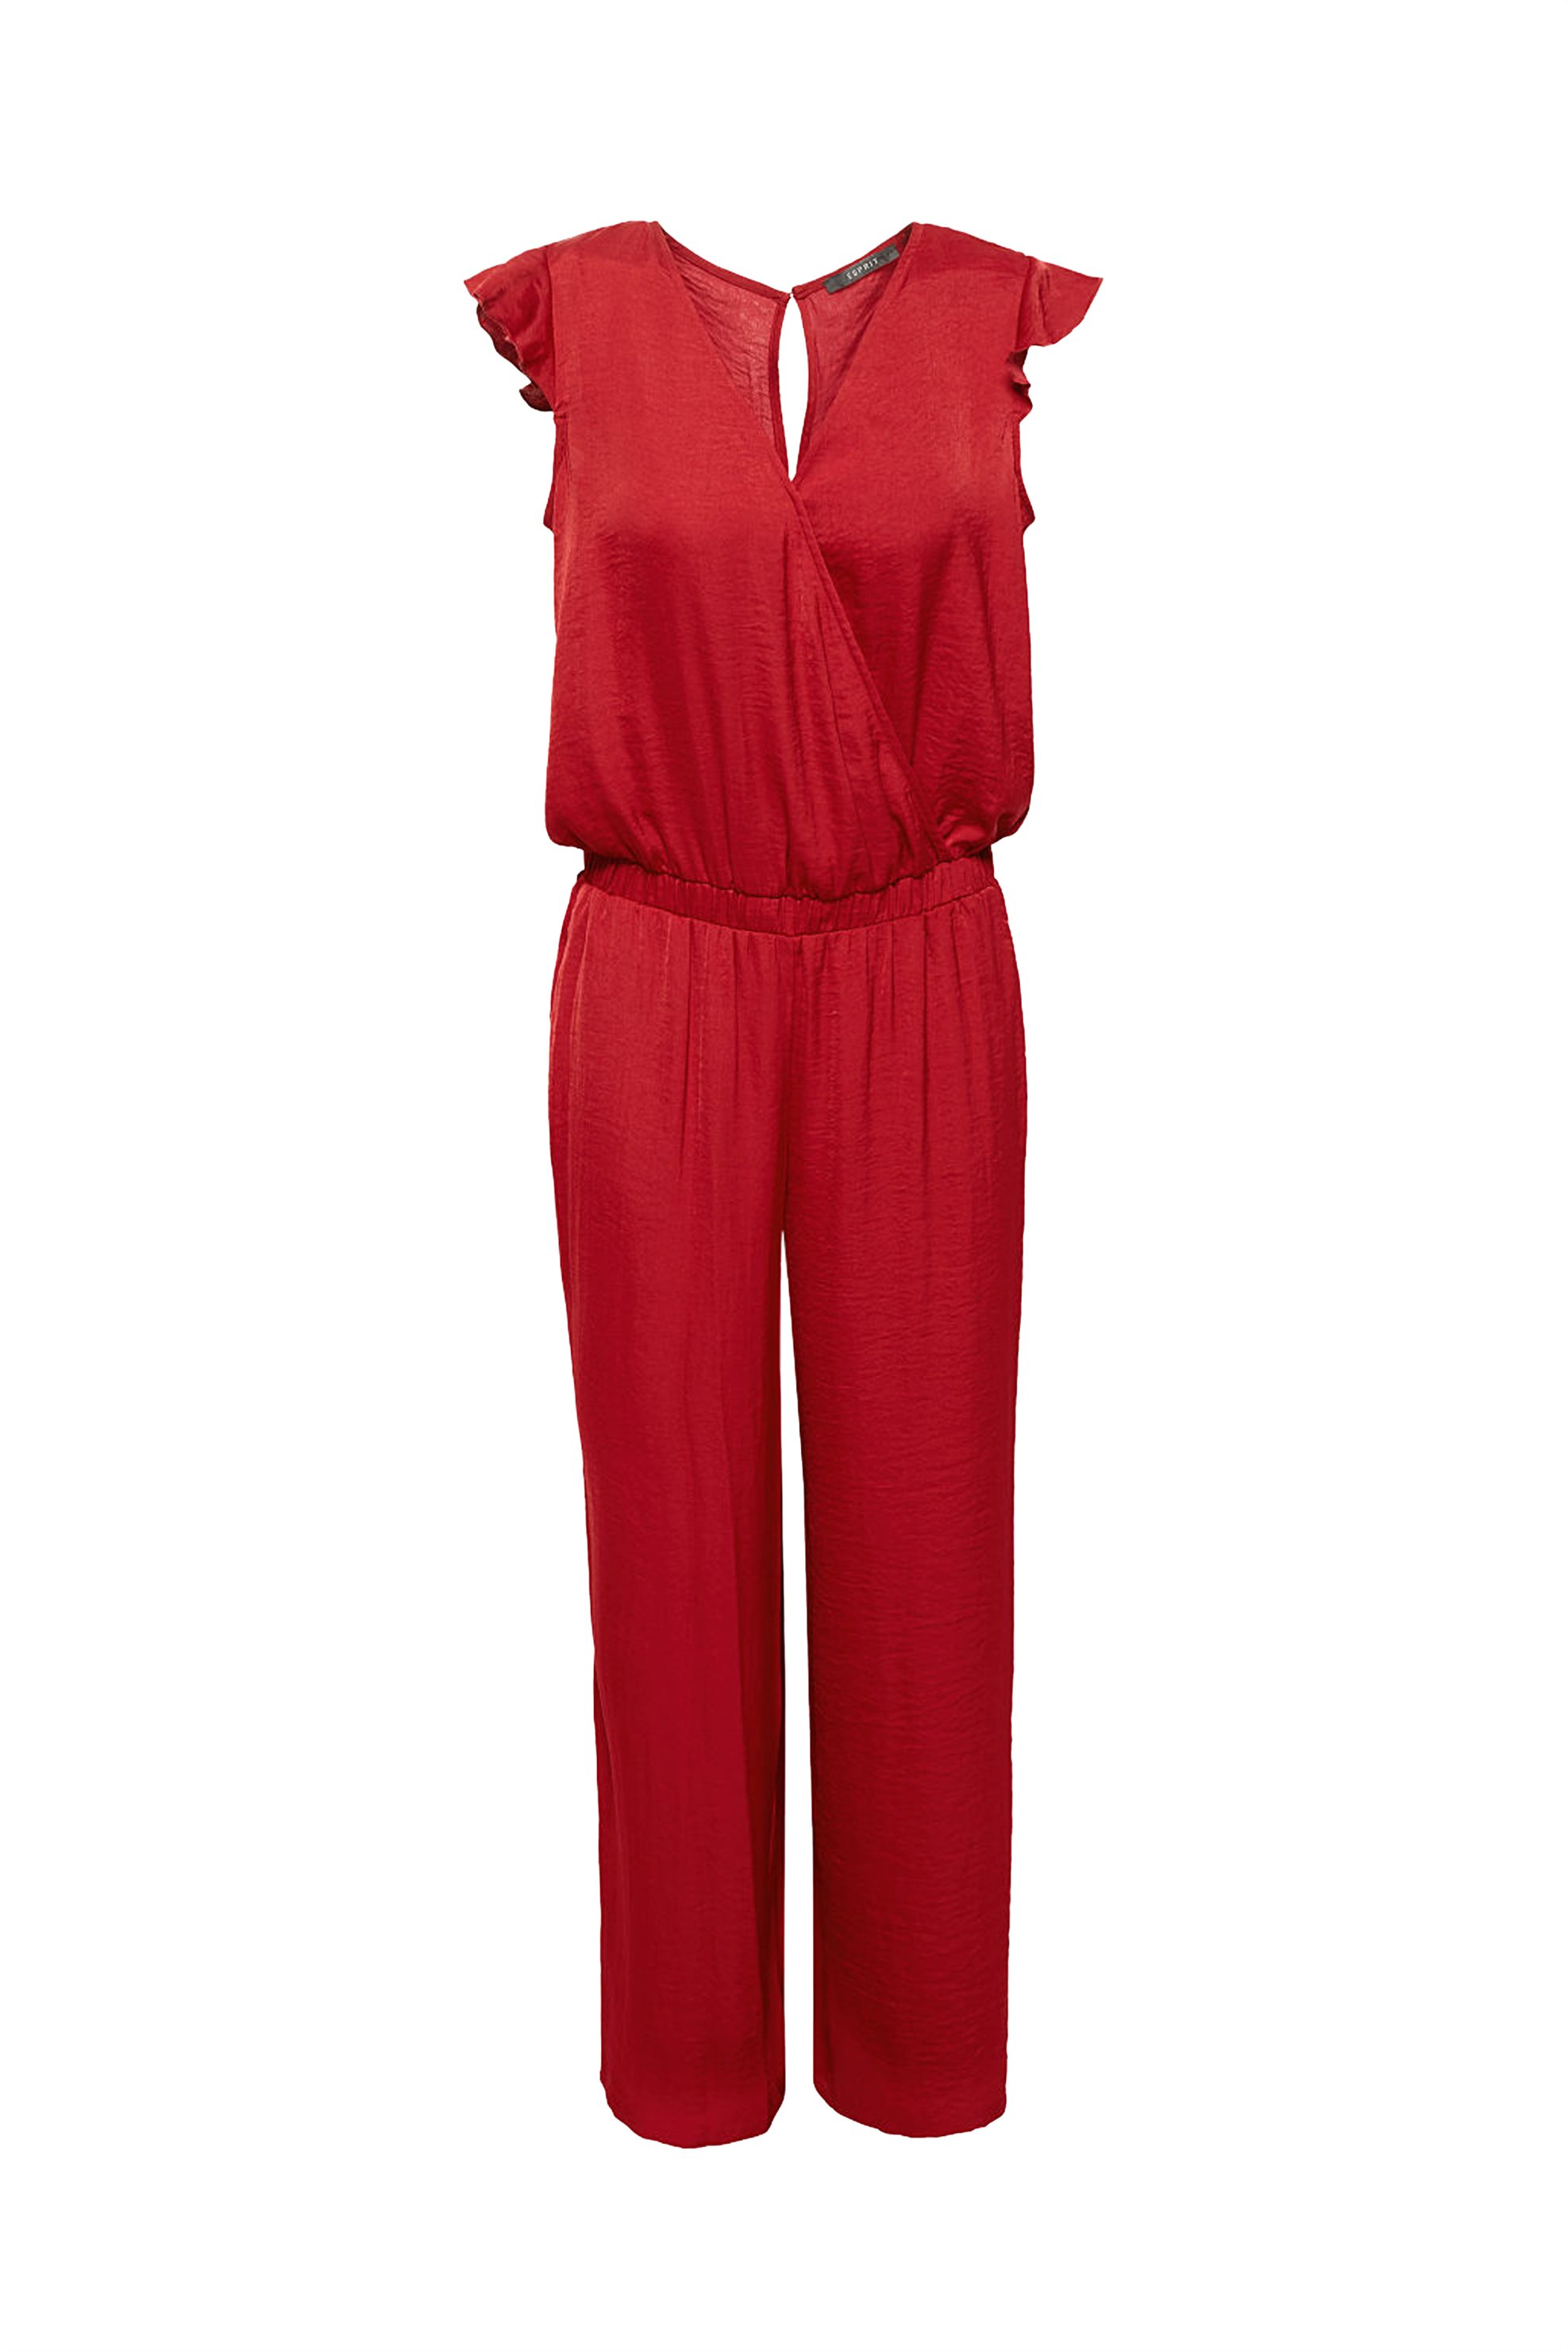 Esprit σατέν γυναικεία ολόσωμη φόρμα - 078EO1L002 - Κόκκινο γυναικα   ρουχα   ολόσωμες φόρμες   σαλοπέτες